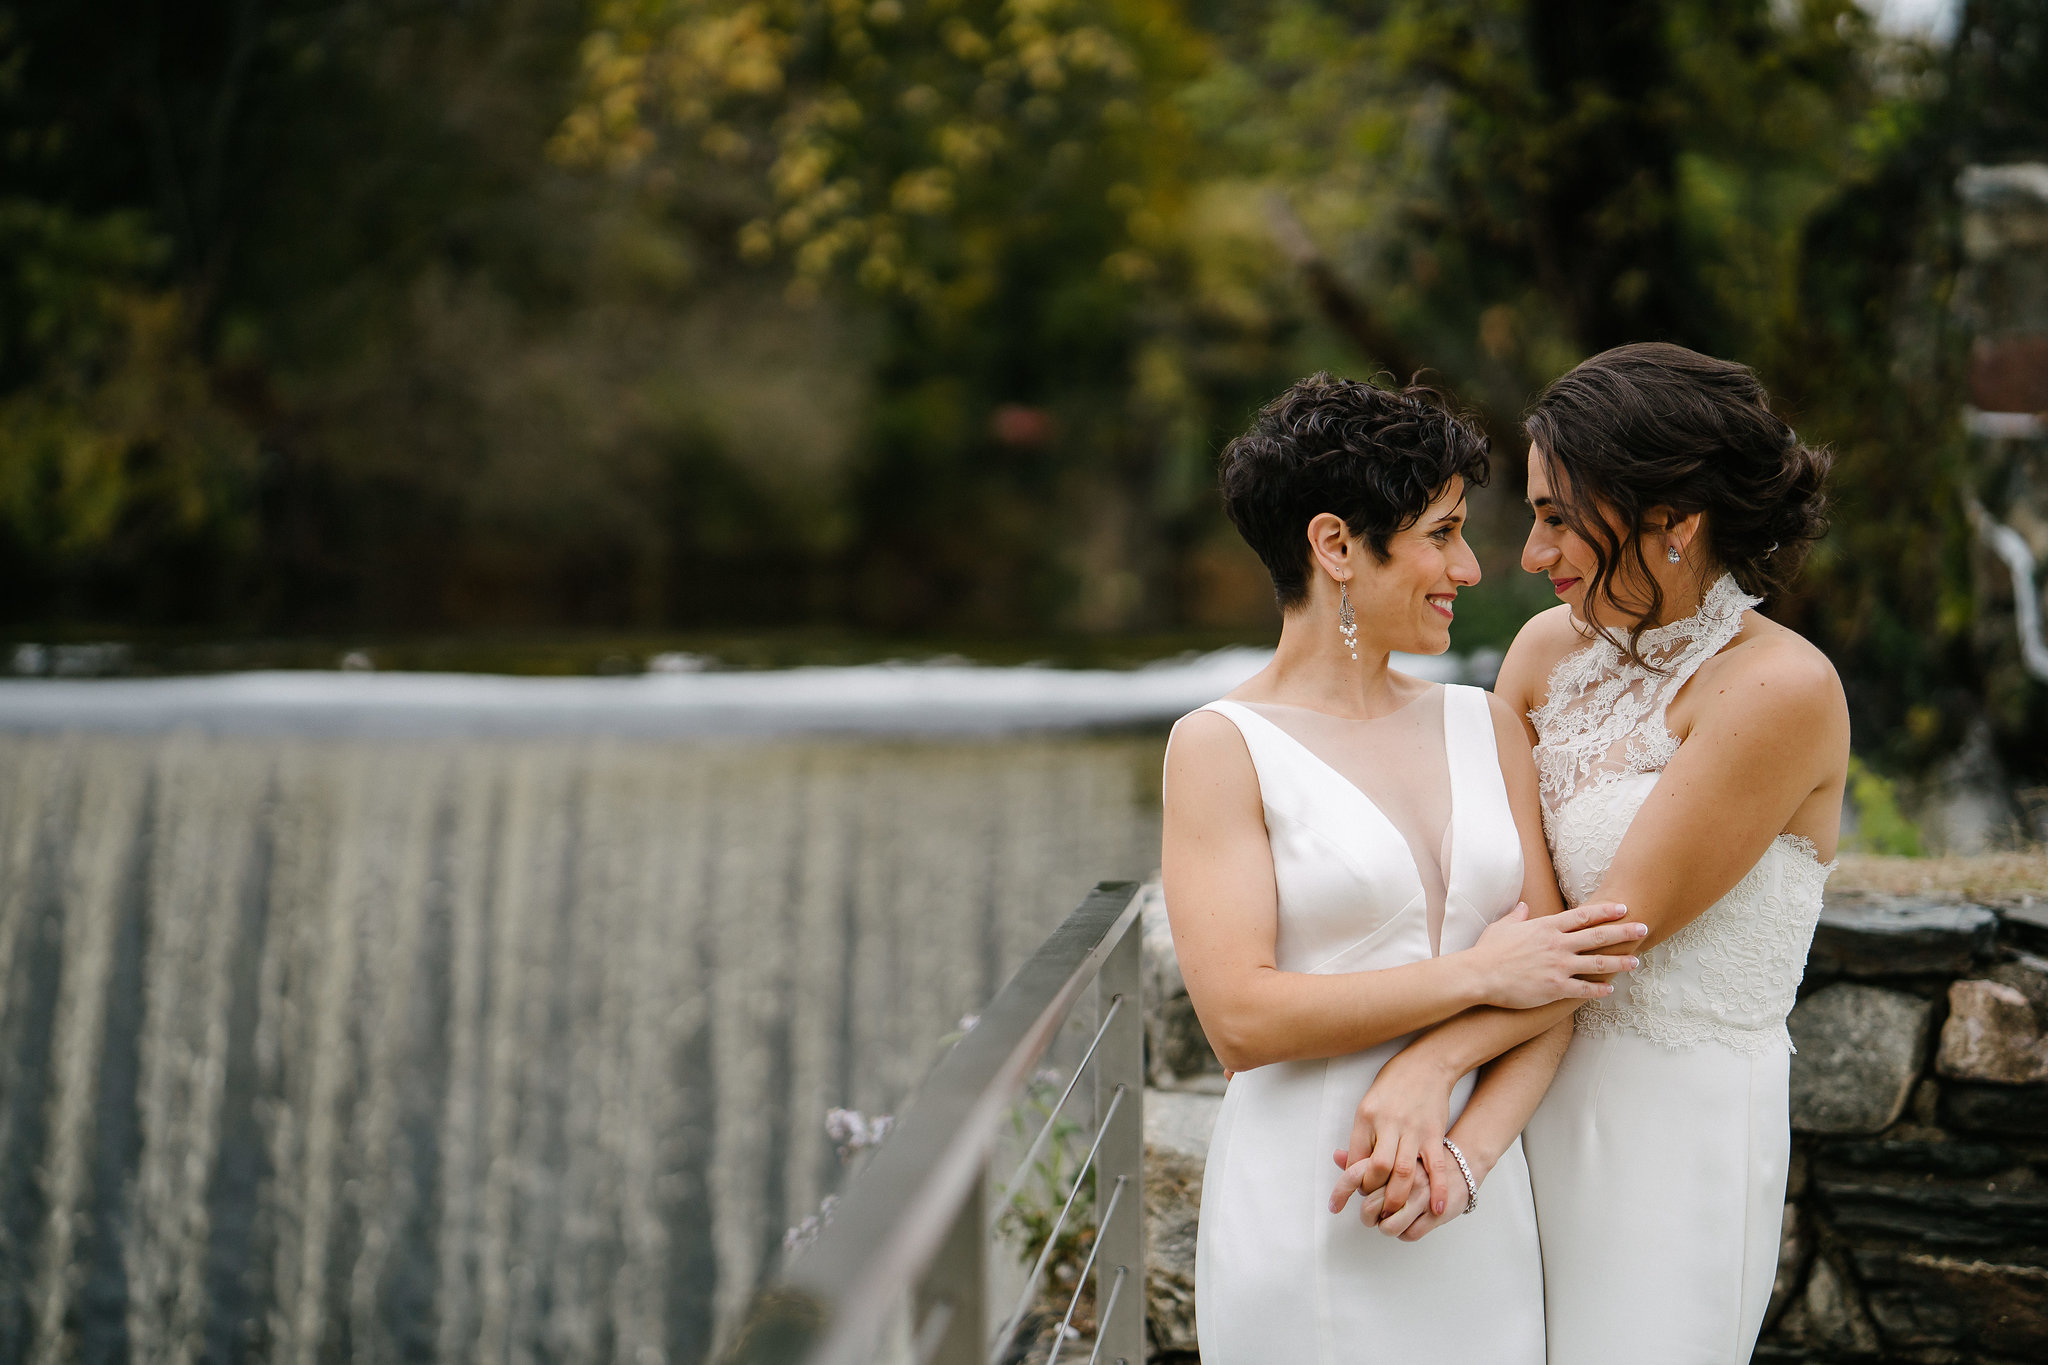 jess-elissa-wedding-192.jpg